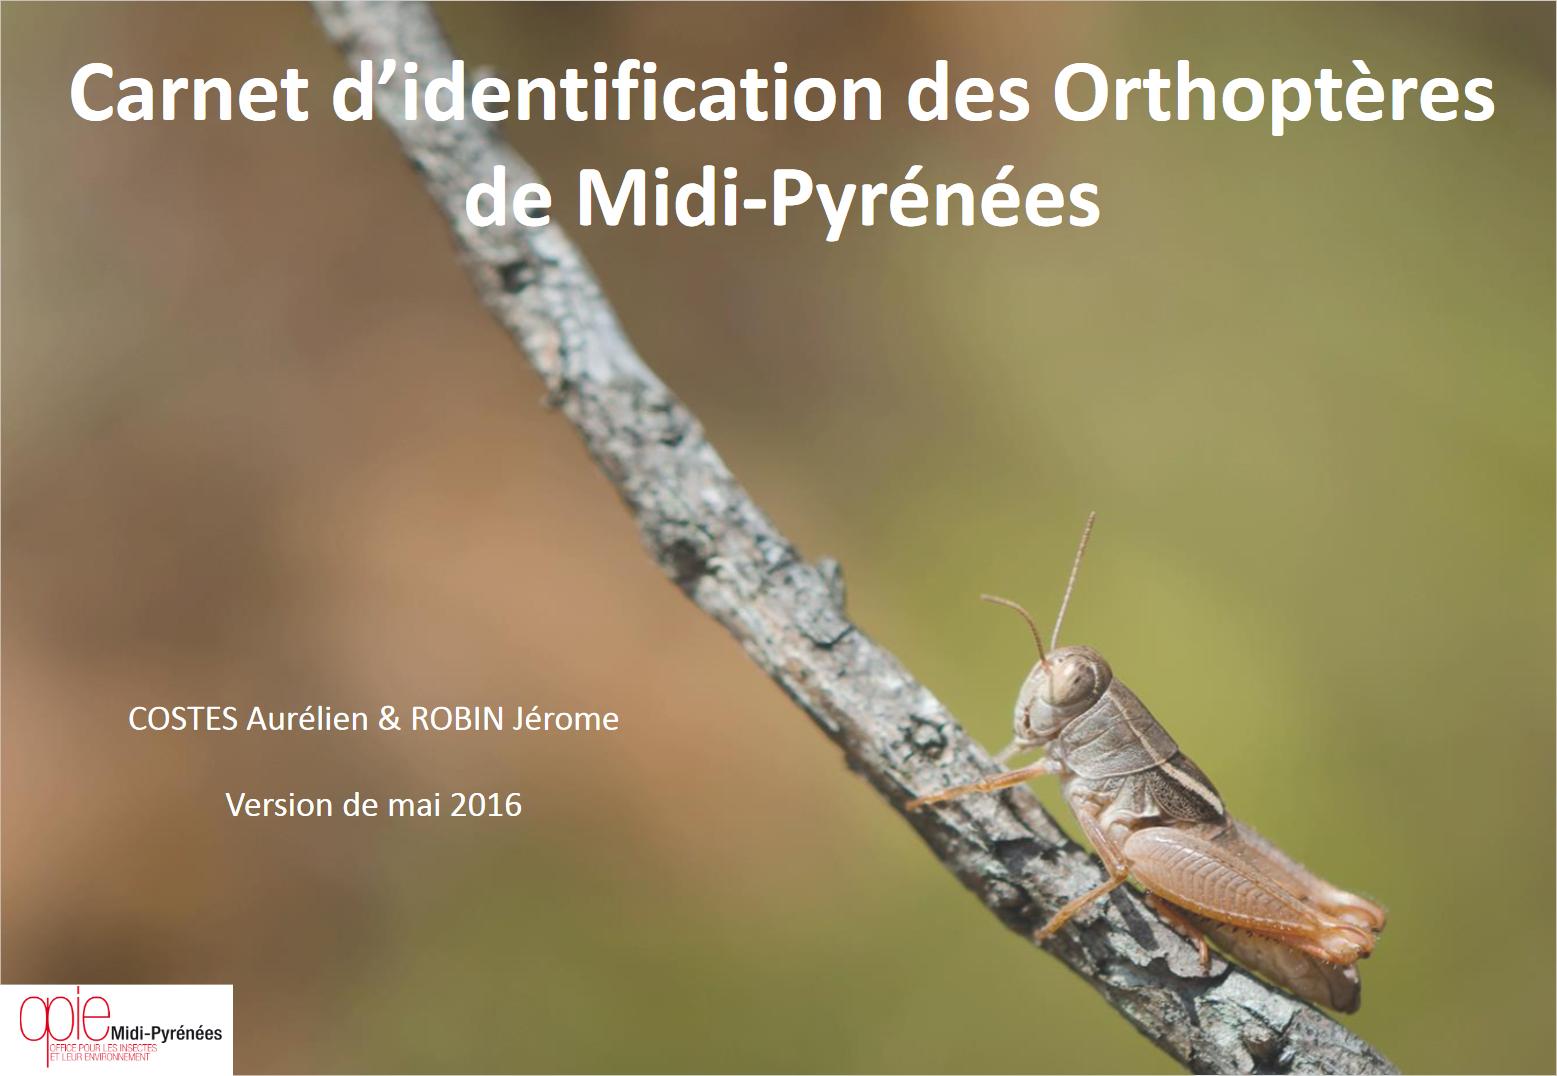 https://cdnfiles1.biolovision.net/www.faune-tarn-aveyron.org/userfiles/page5.jpg